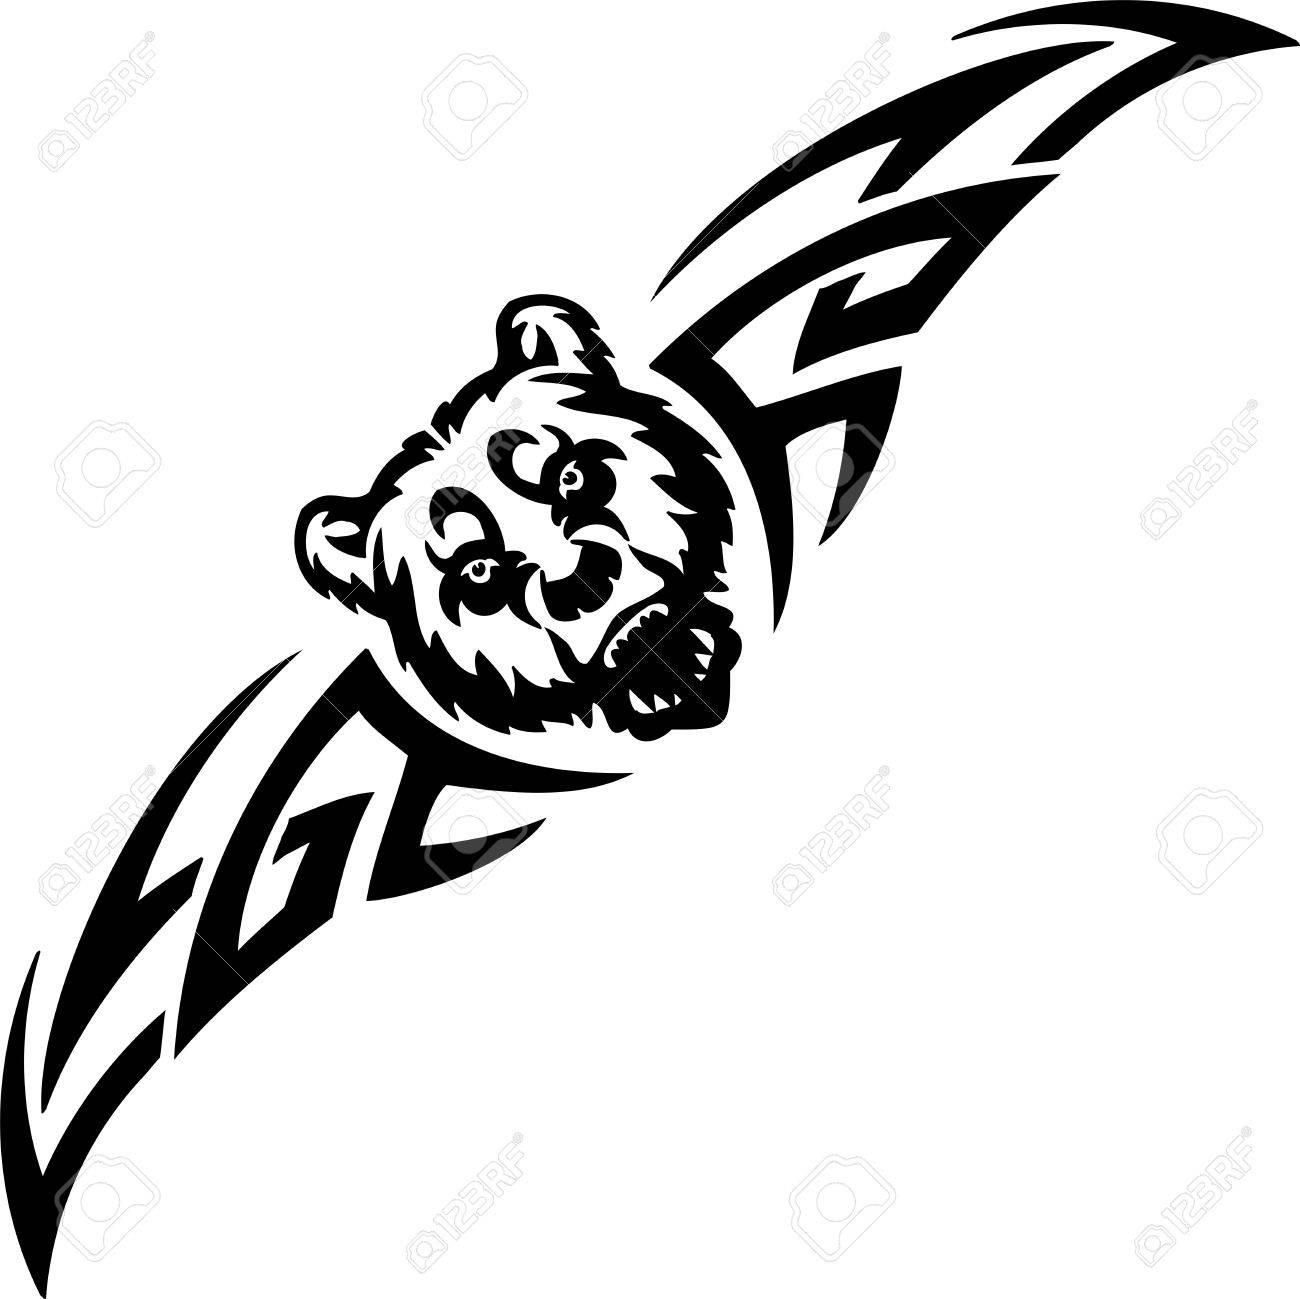 Bear and symmetric tribals Stock Vector - 14096735